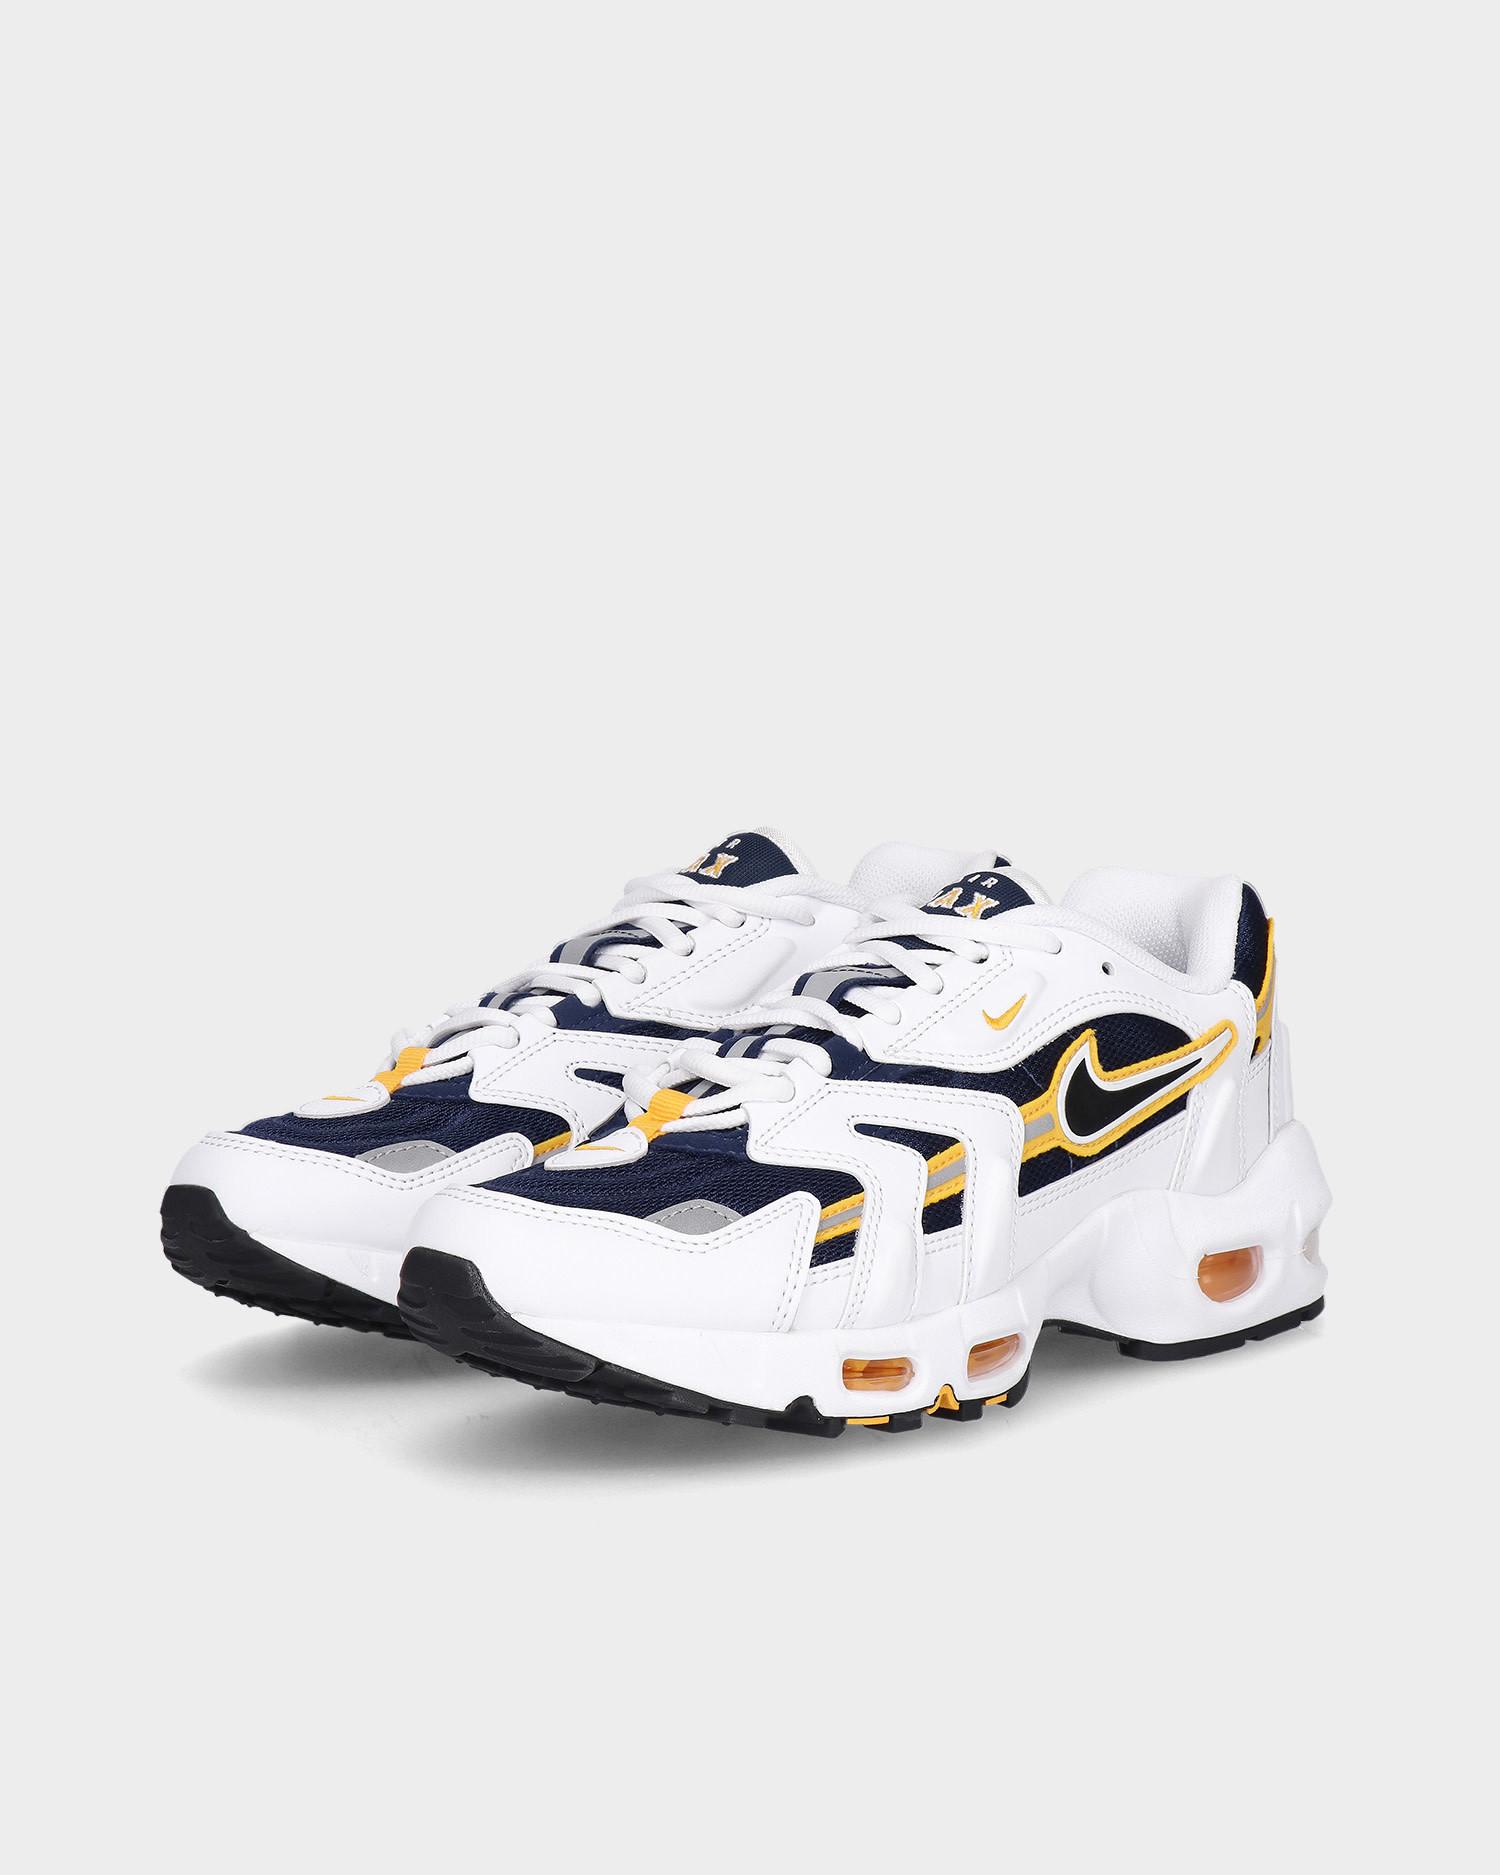 Nike air max 96 ii White/black-midnight navy